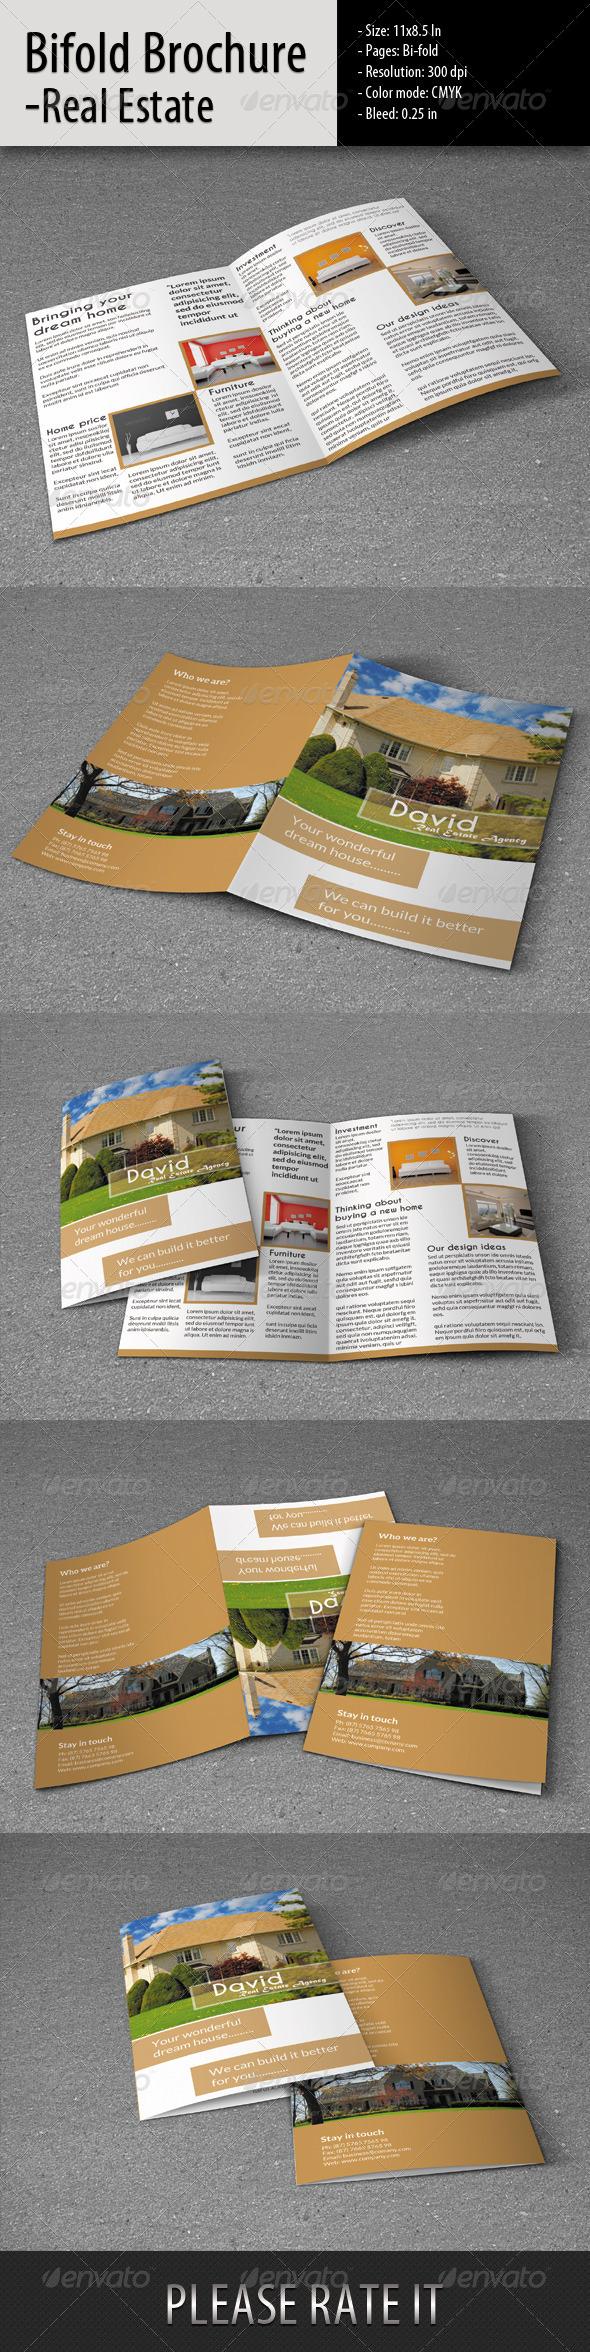 Bifold Brochure for Real Estate - Corporate Brochures